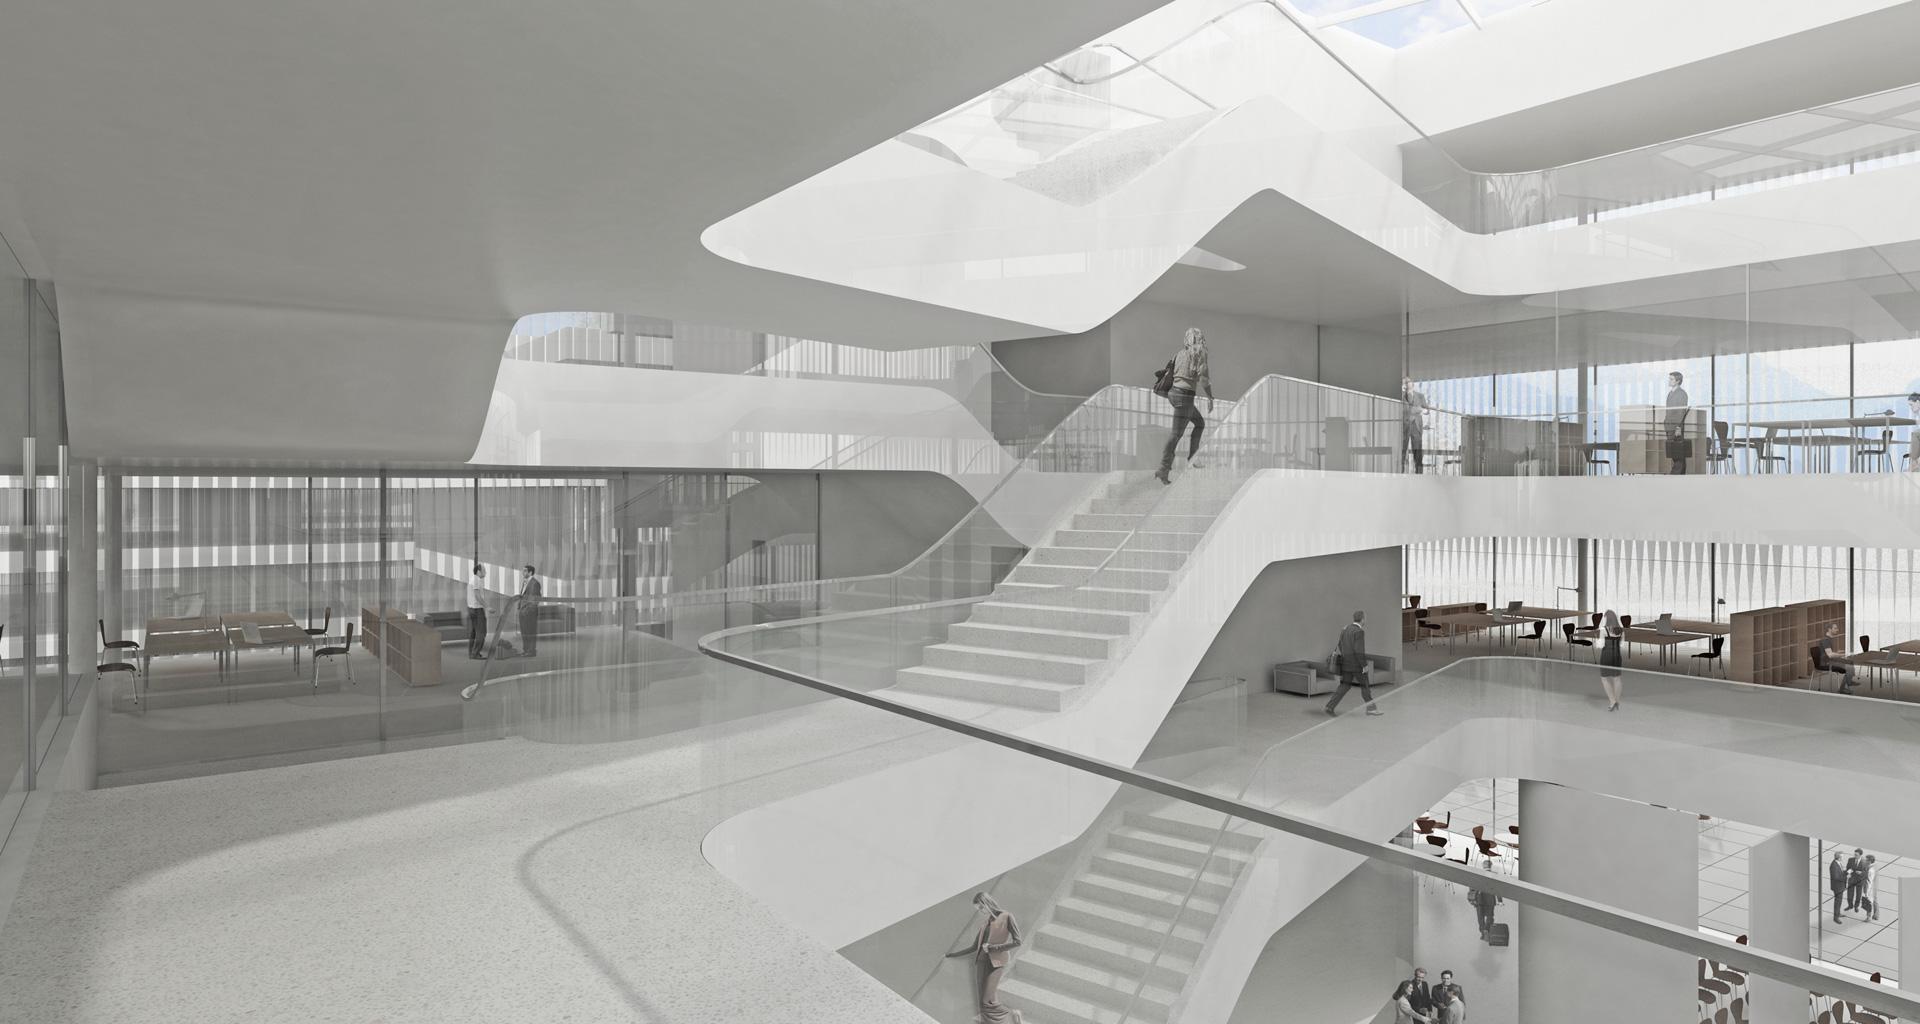 005-first-office-building-buero-philipp-moeller.jpg